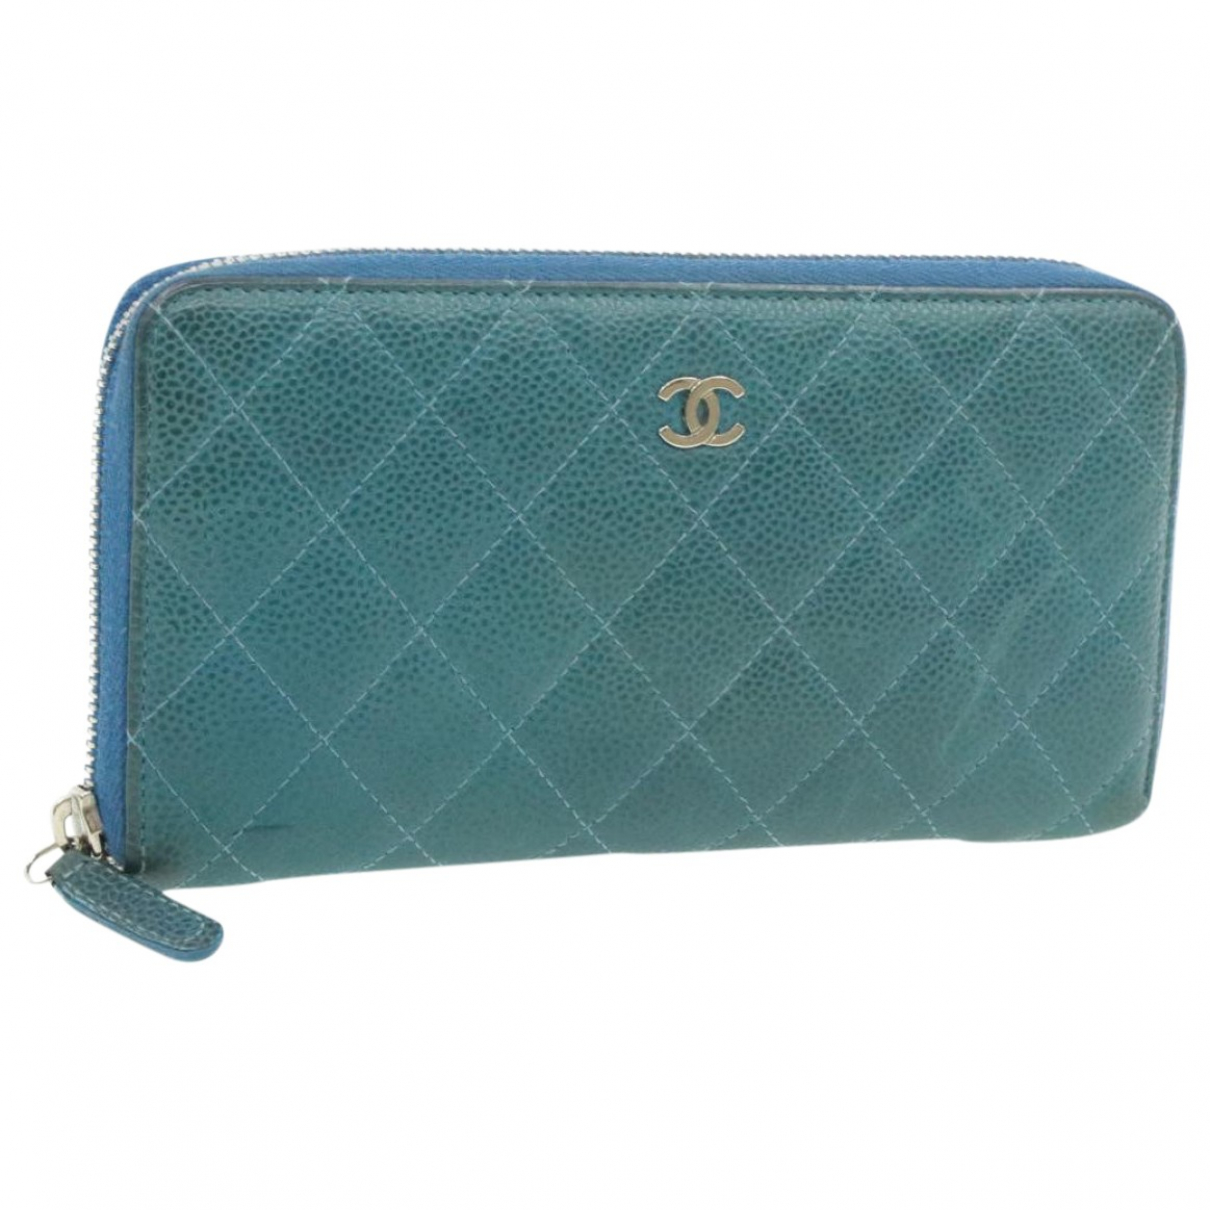 Chanel \N Schal in  Blau Viskose